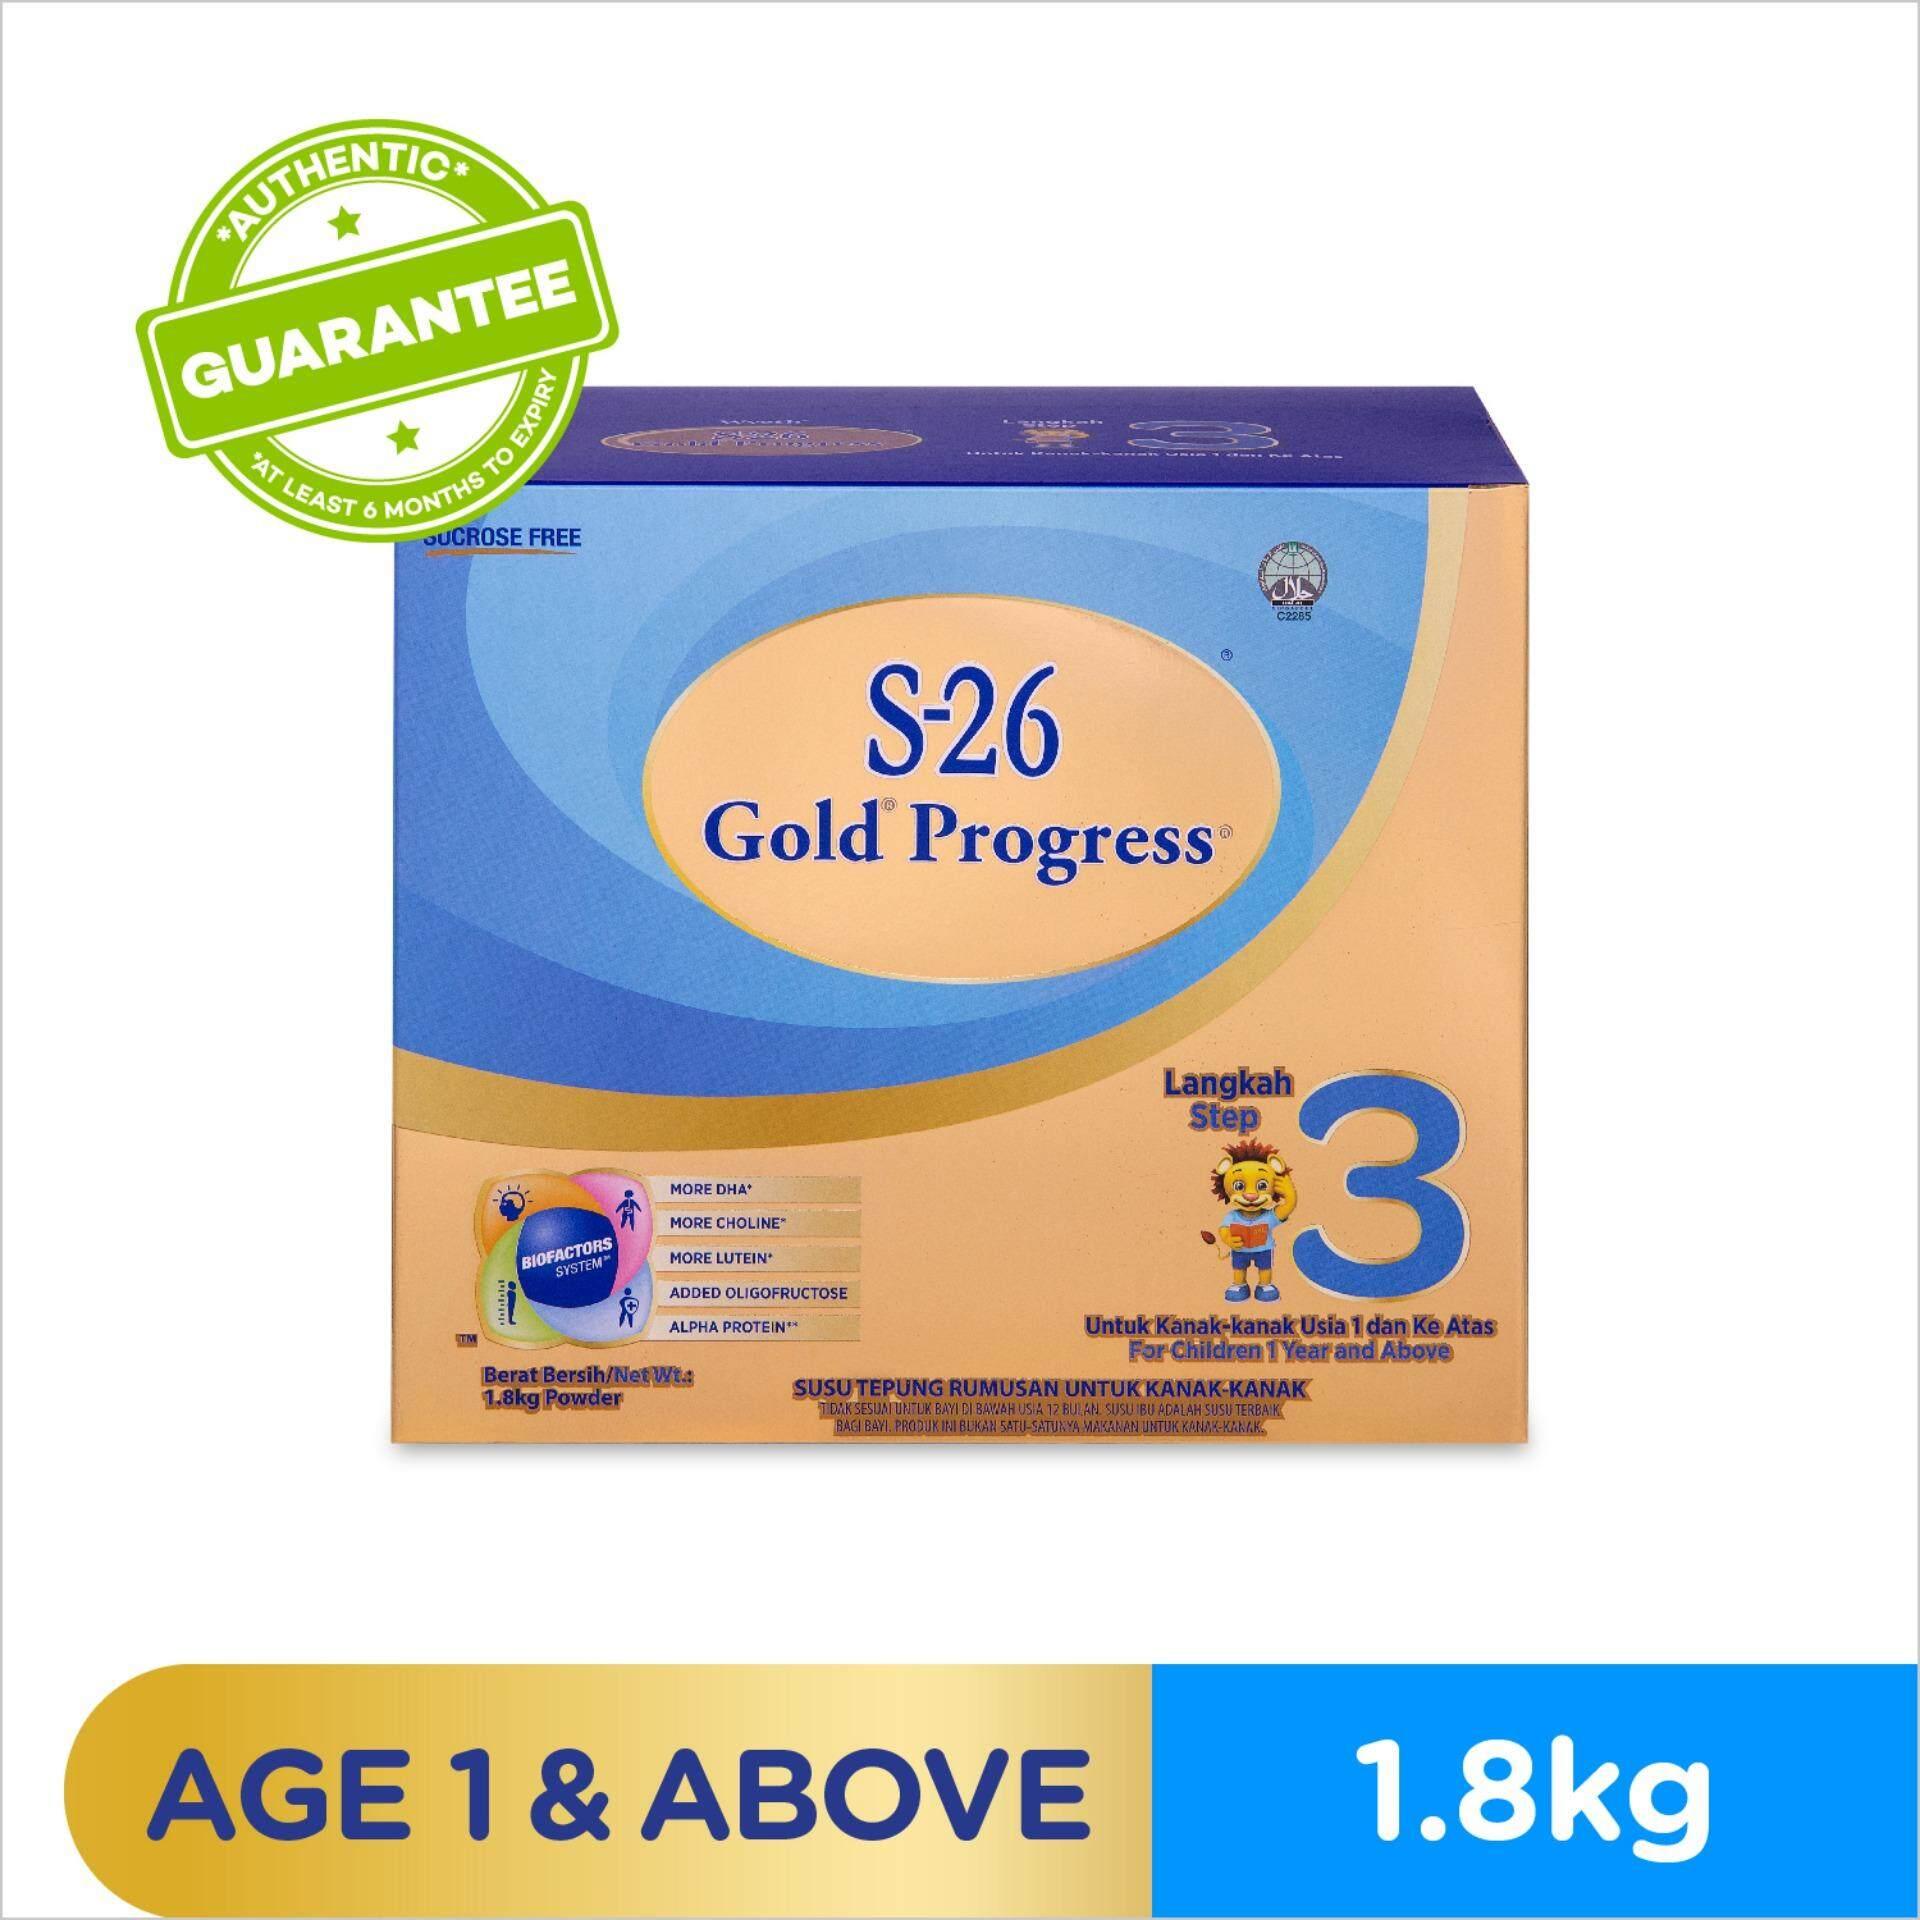 Milk Formula Buy At Best Price In Malaysia Www Chil Kid Regular 3 Untuk Usia 1 Tahun 800gr S 26 Gold Progress Powder 18kg